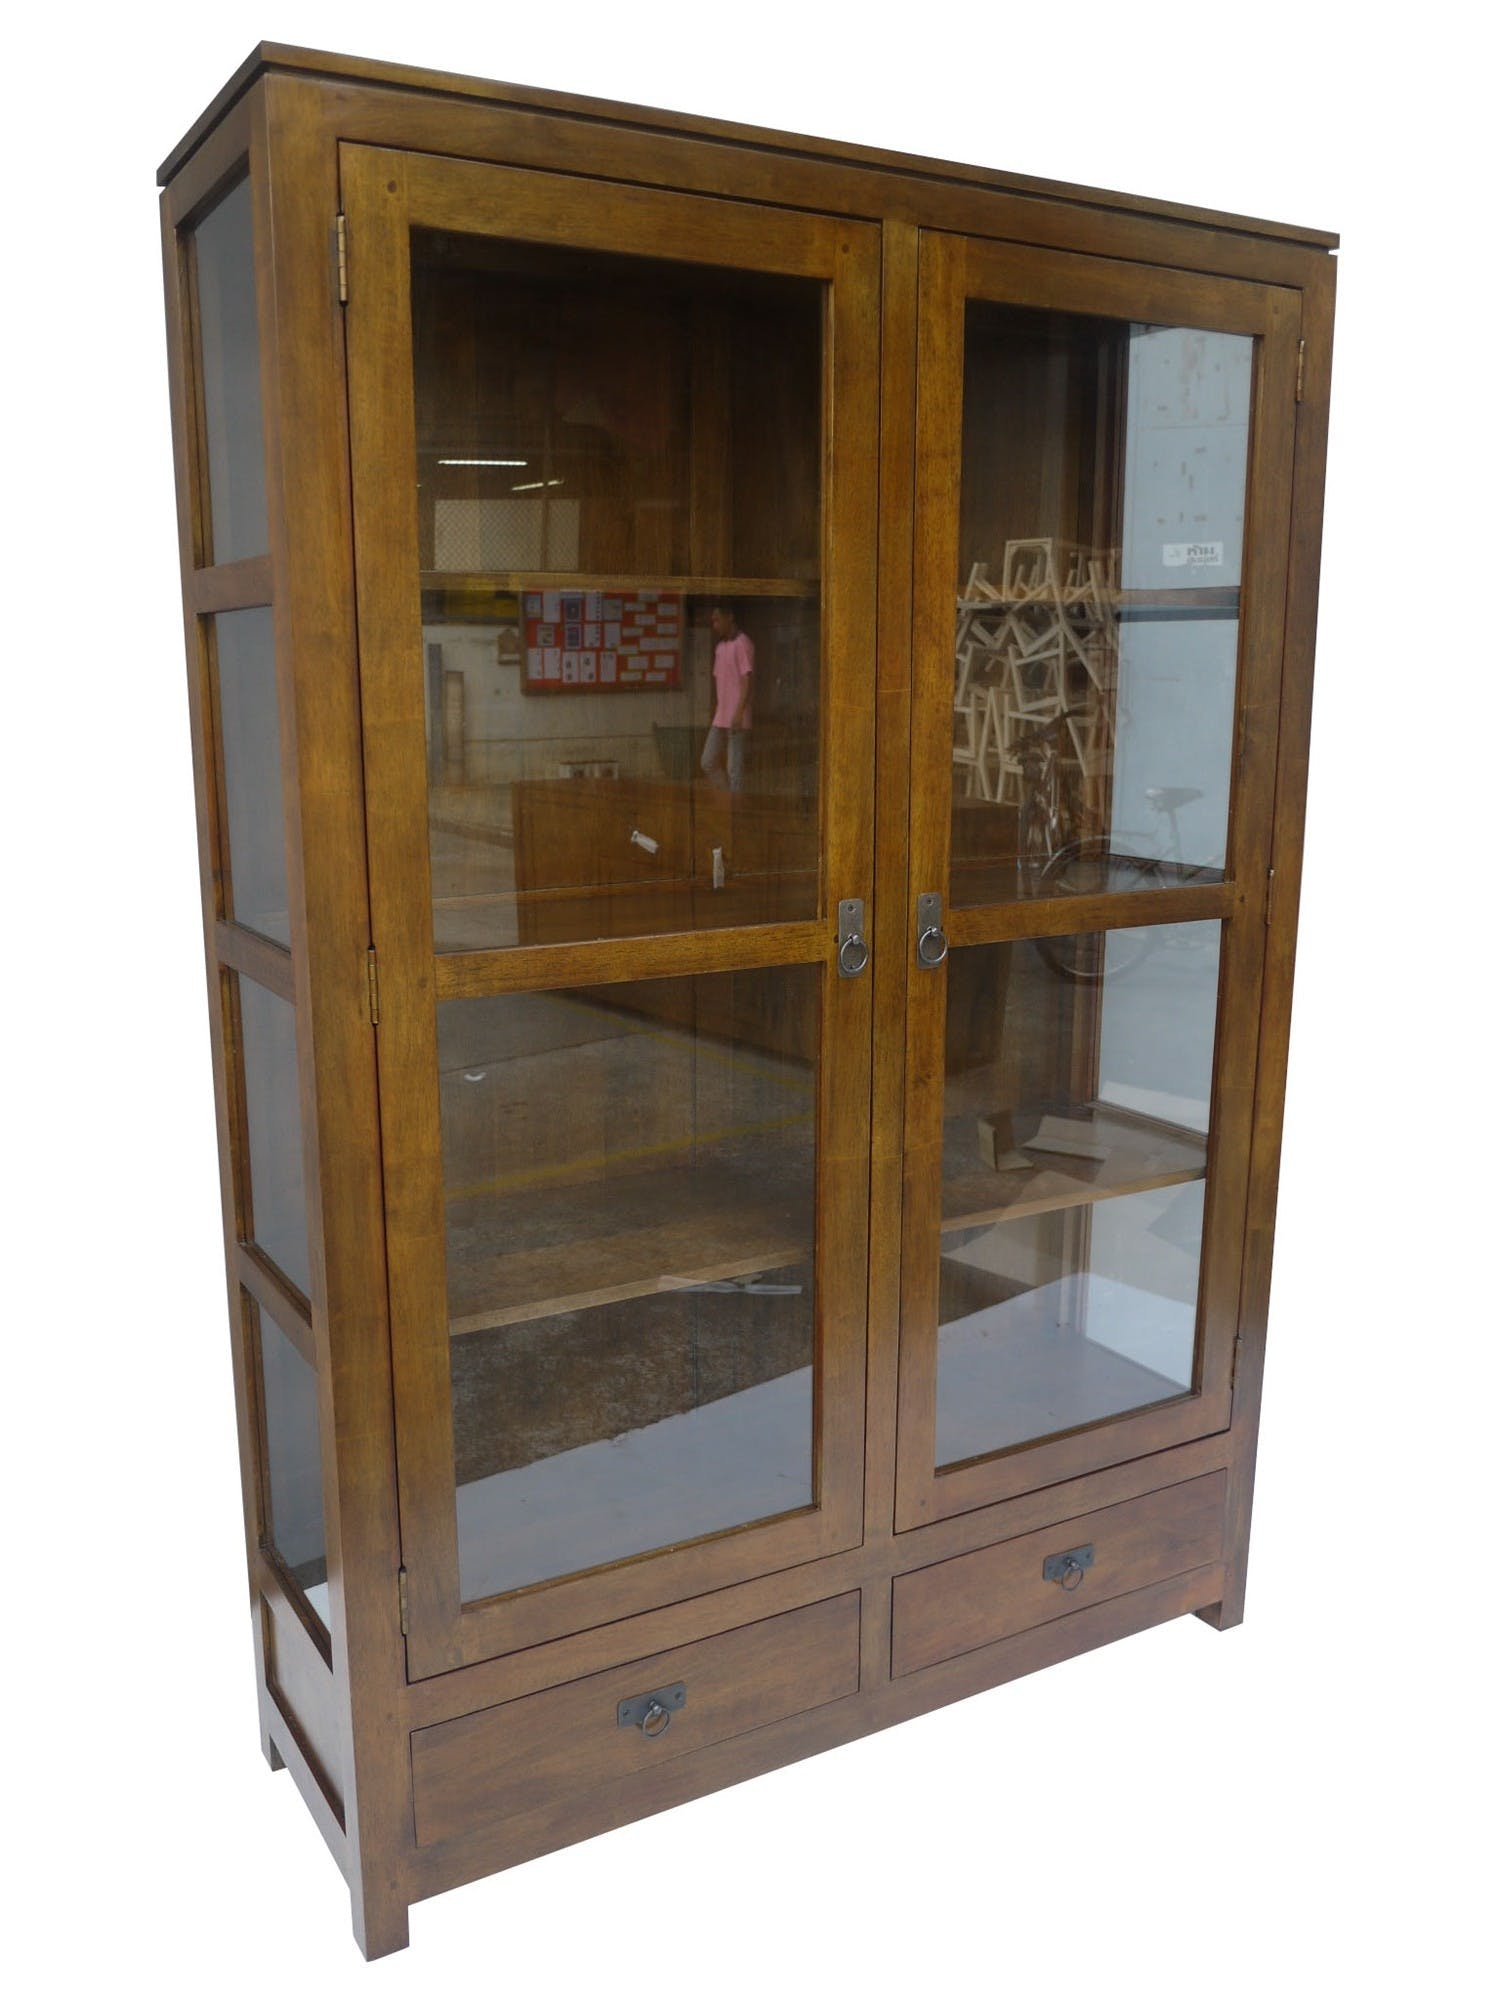 Bibliothèque vitrée Hévéa 2 portes, 2 tiroirs, 120x38x170cm HELENA